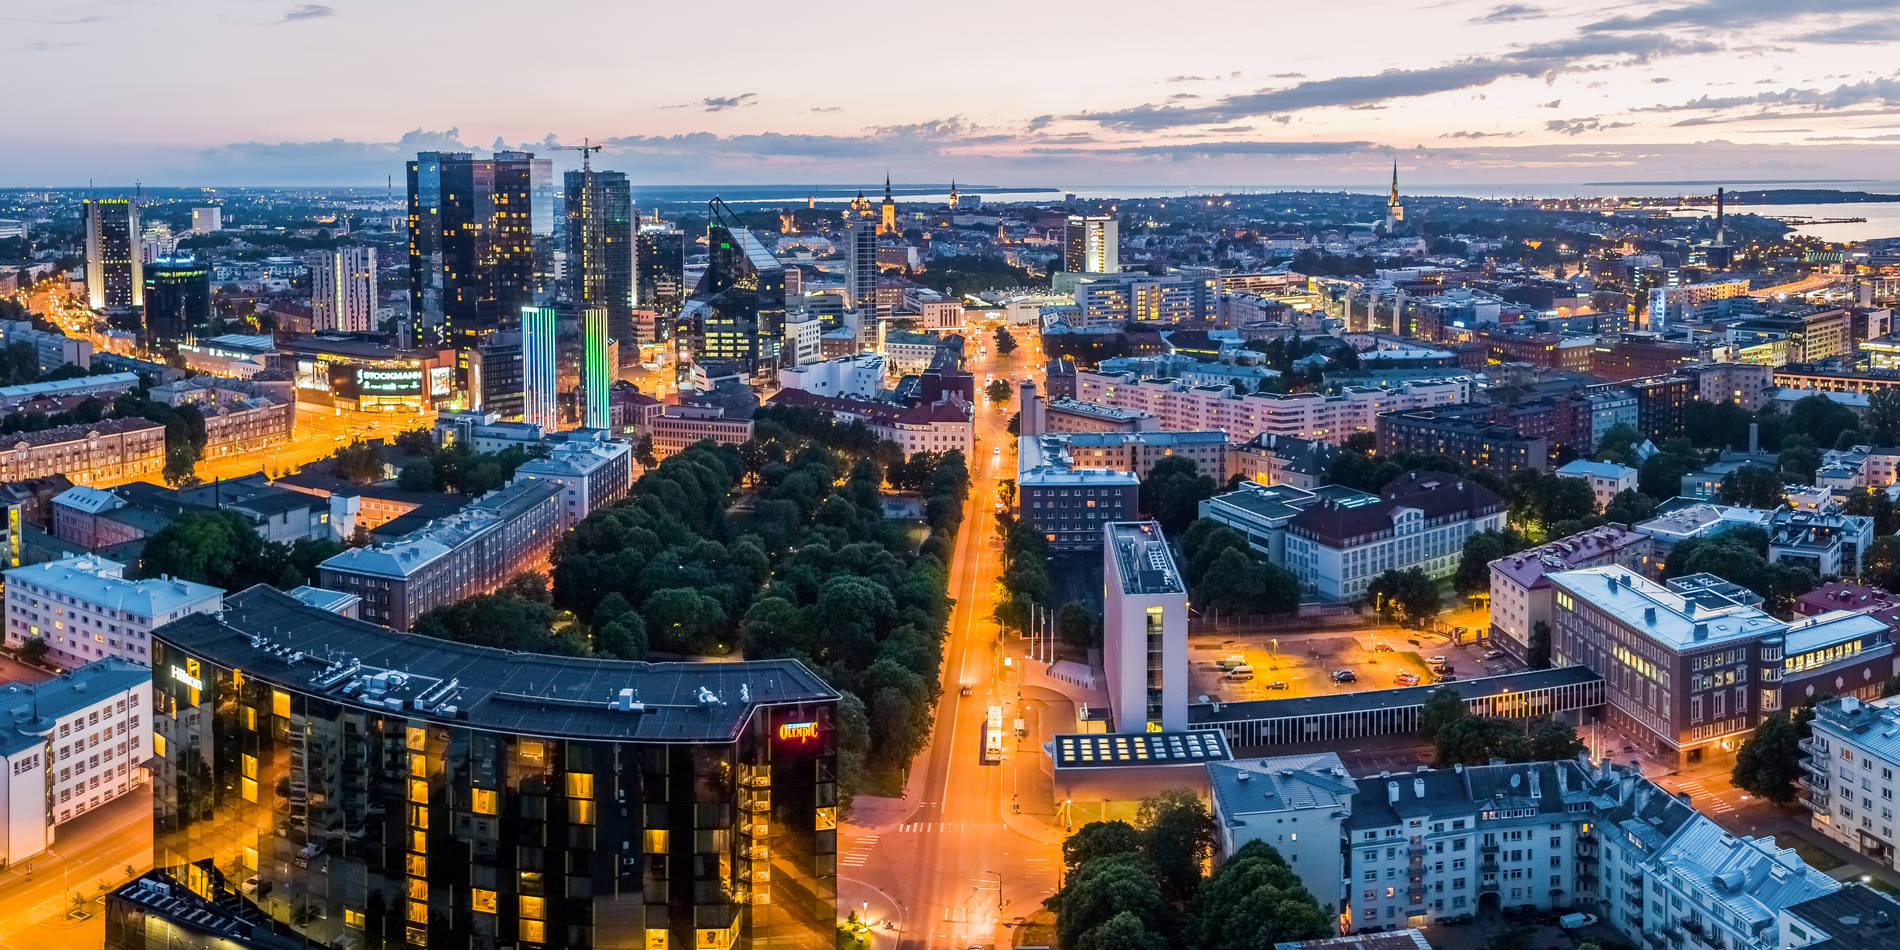 Aerial view of Tallinn City Centre Photo by: Kaupo Kalda